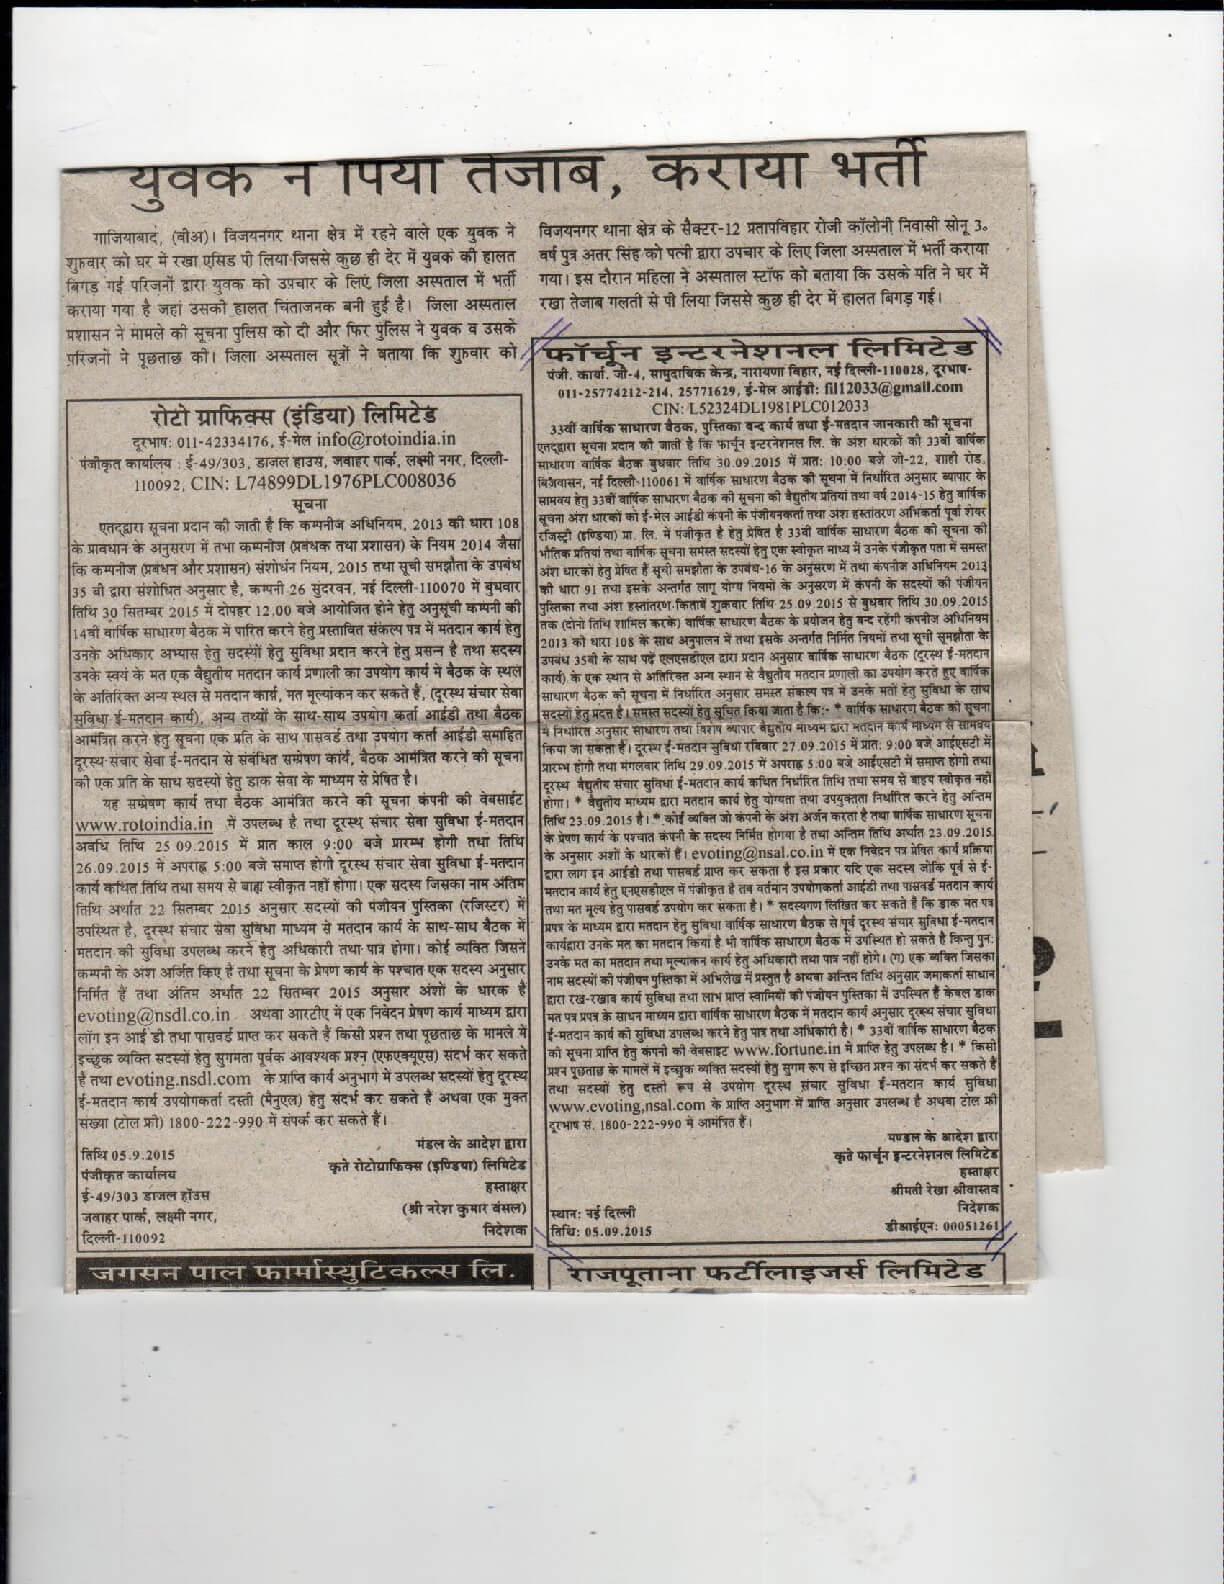 AGM Newspaper cutting-Hindi_2015